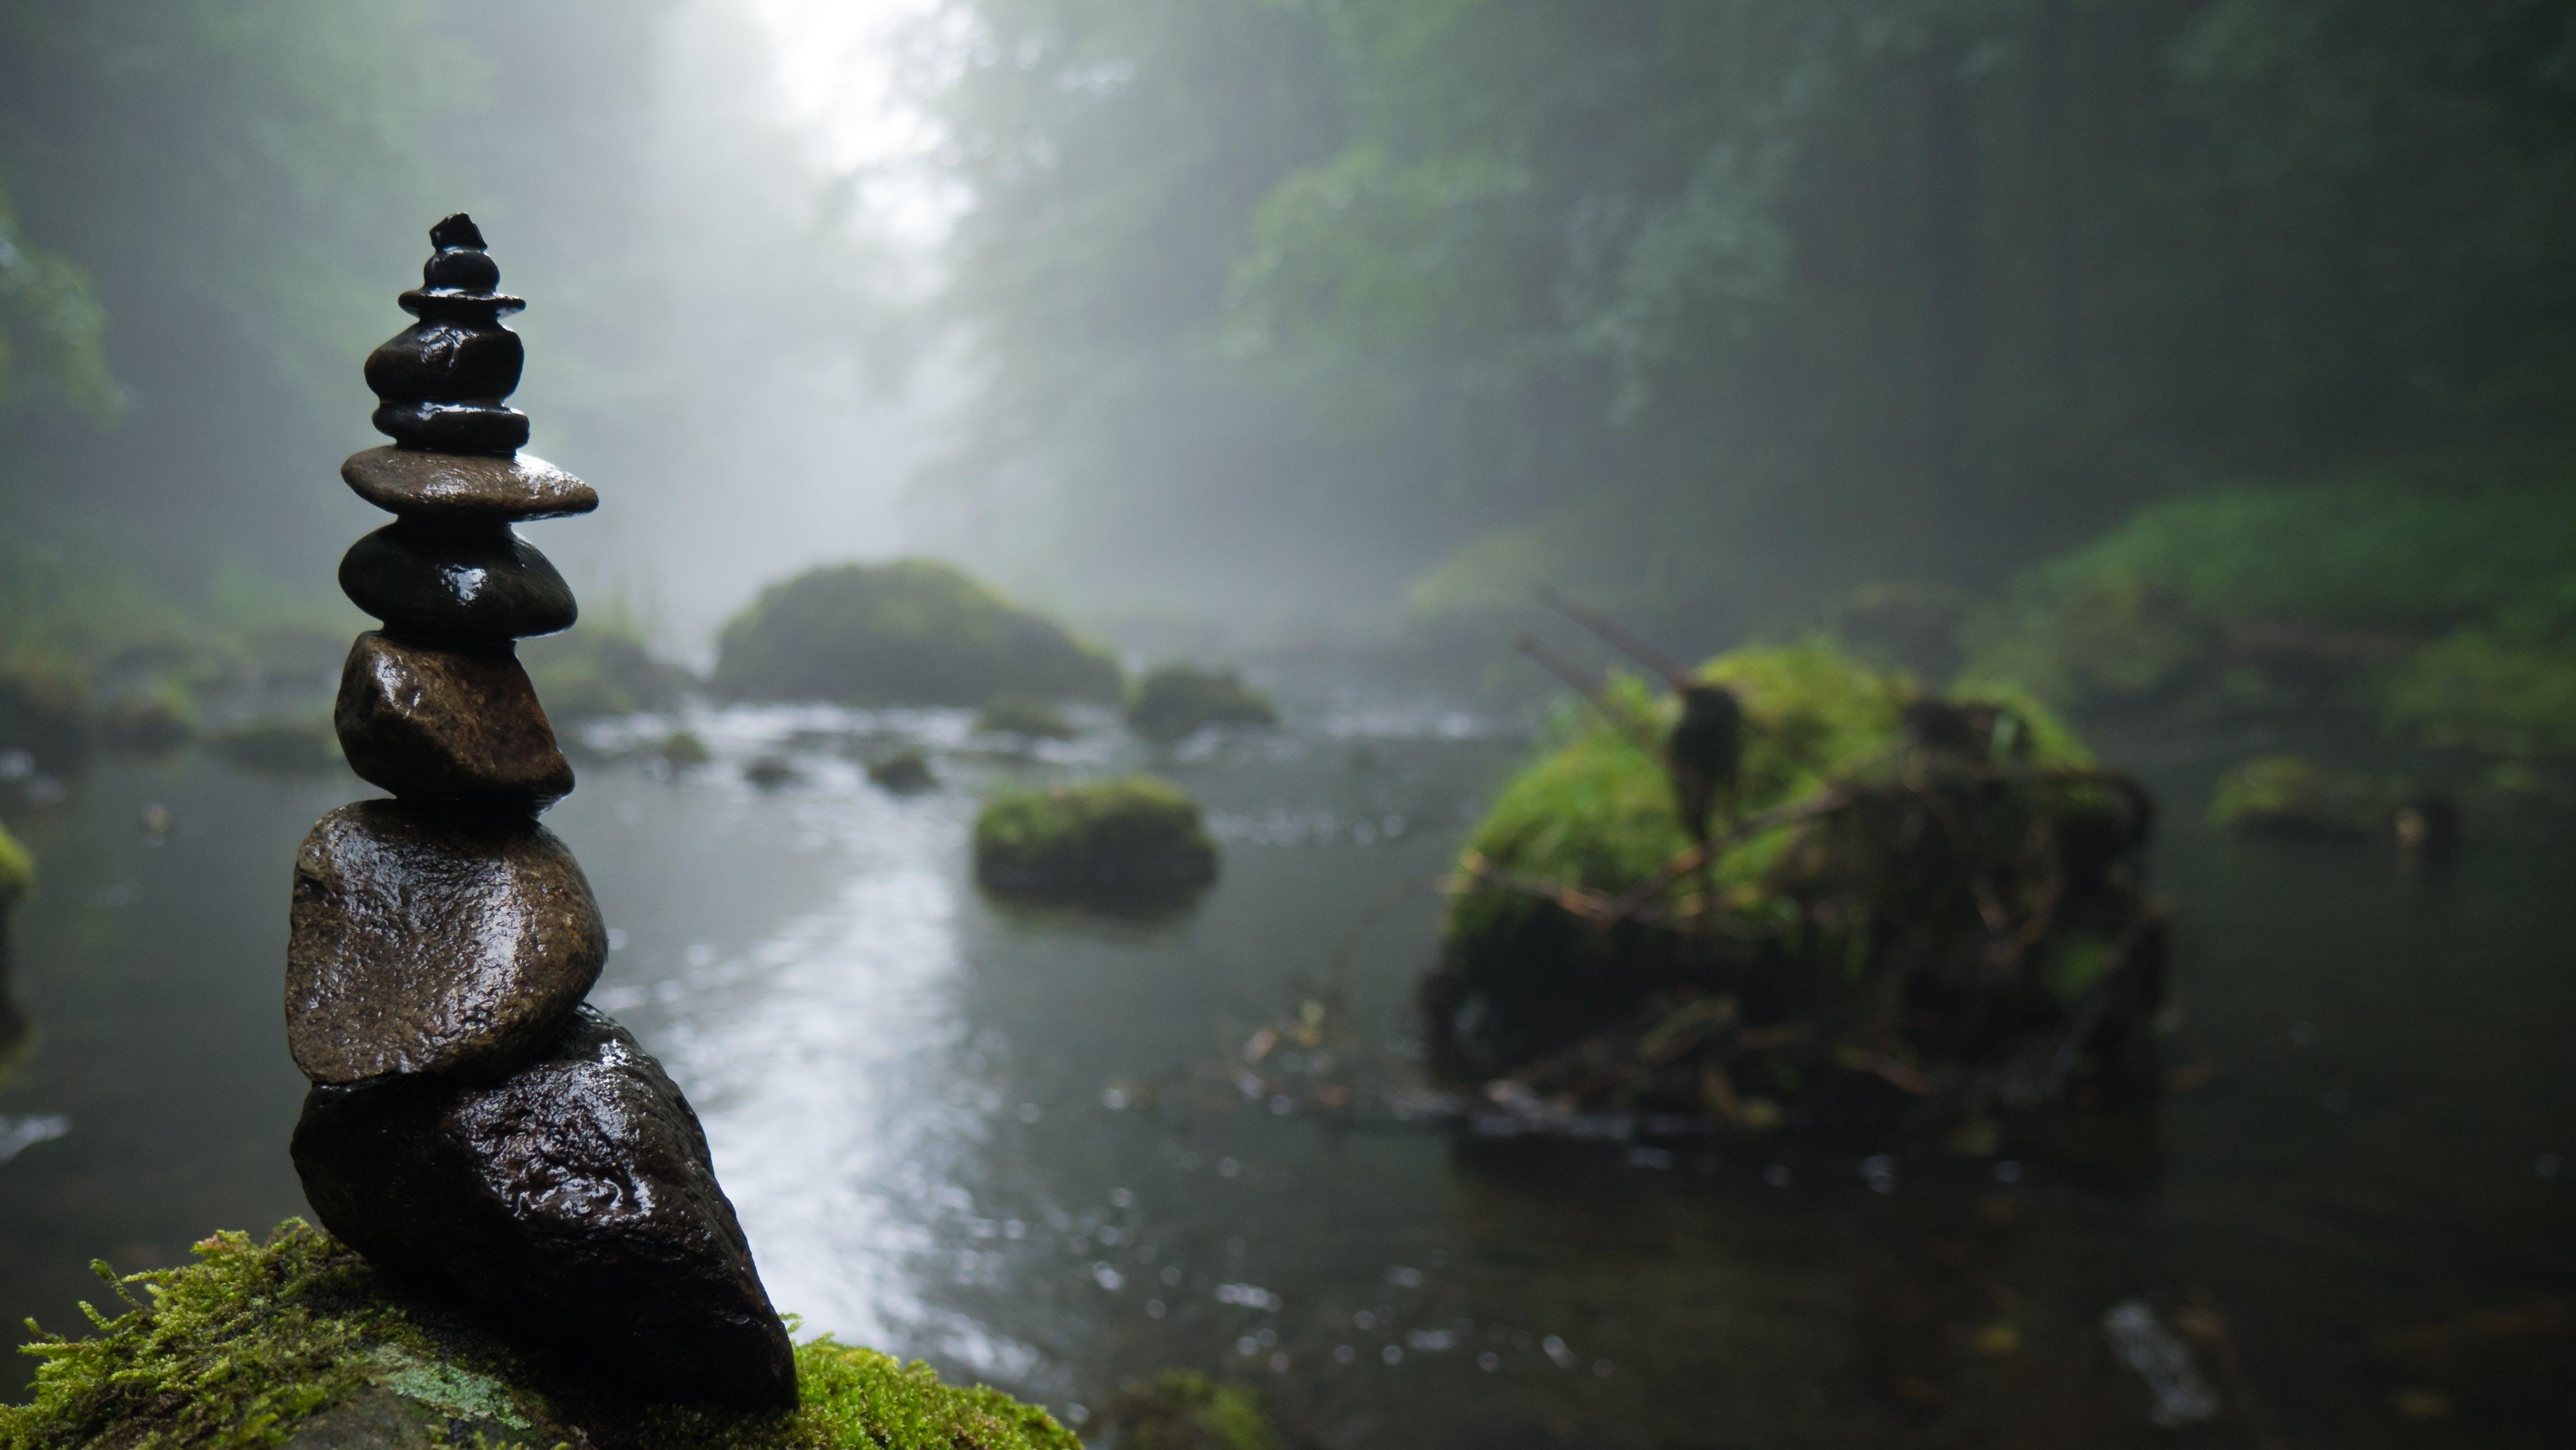 Fotos de stock gratuitas de agua, apilar piedras, arboles, bosque